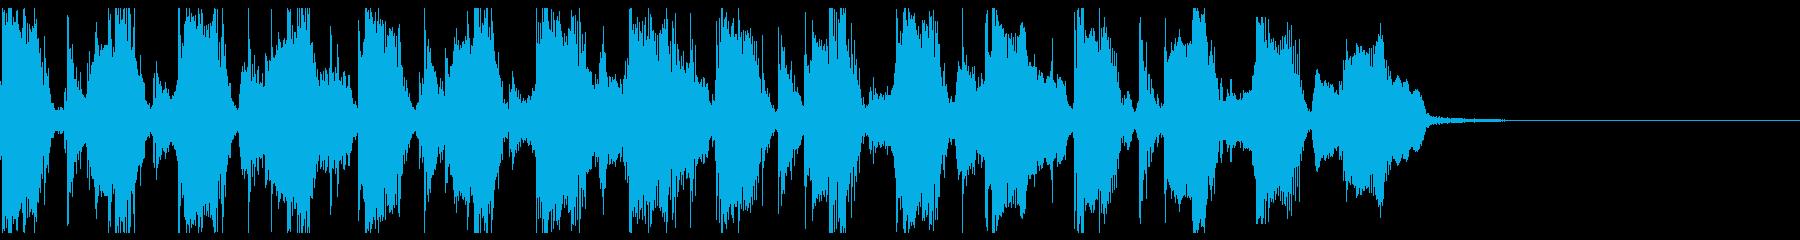 Afro Techなシンキングタイム音の再生済みの波形